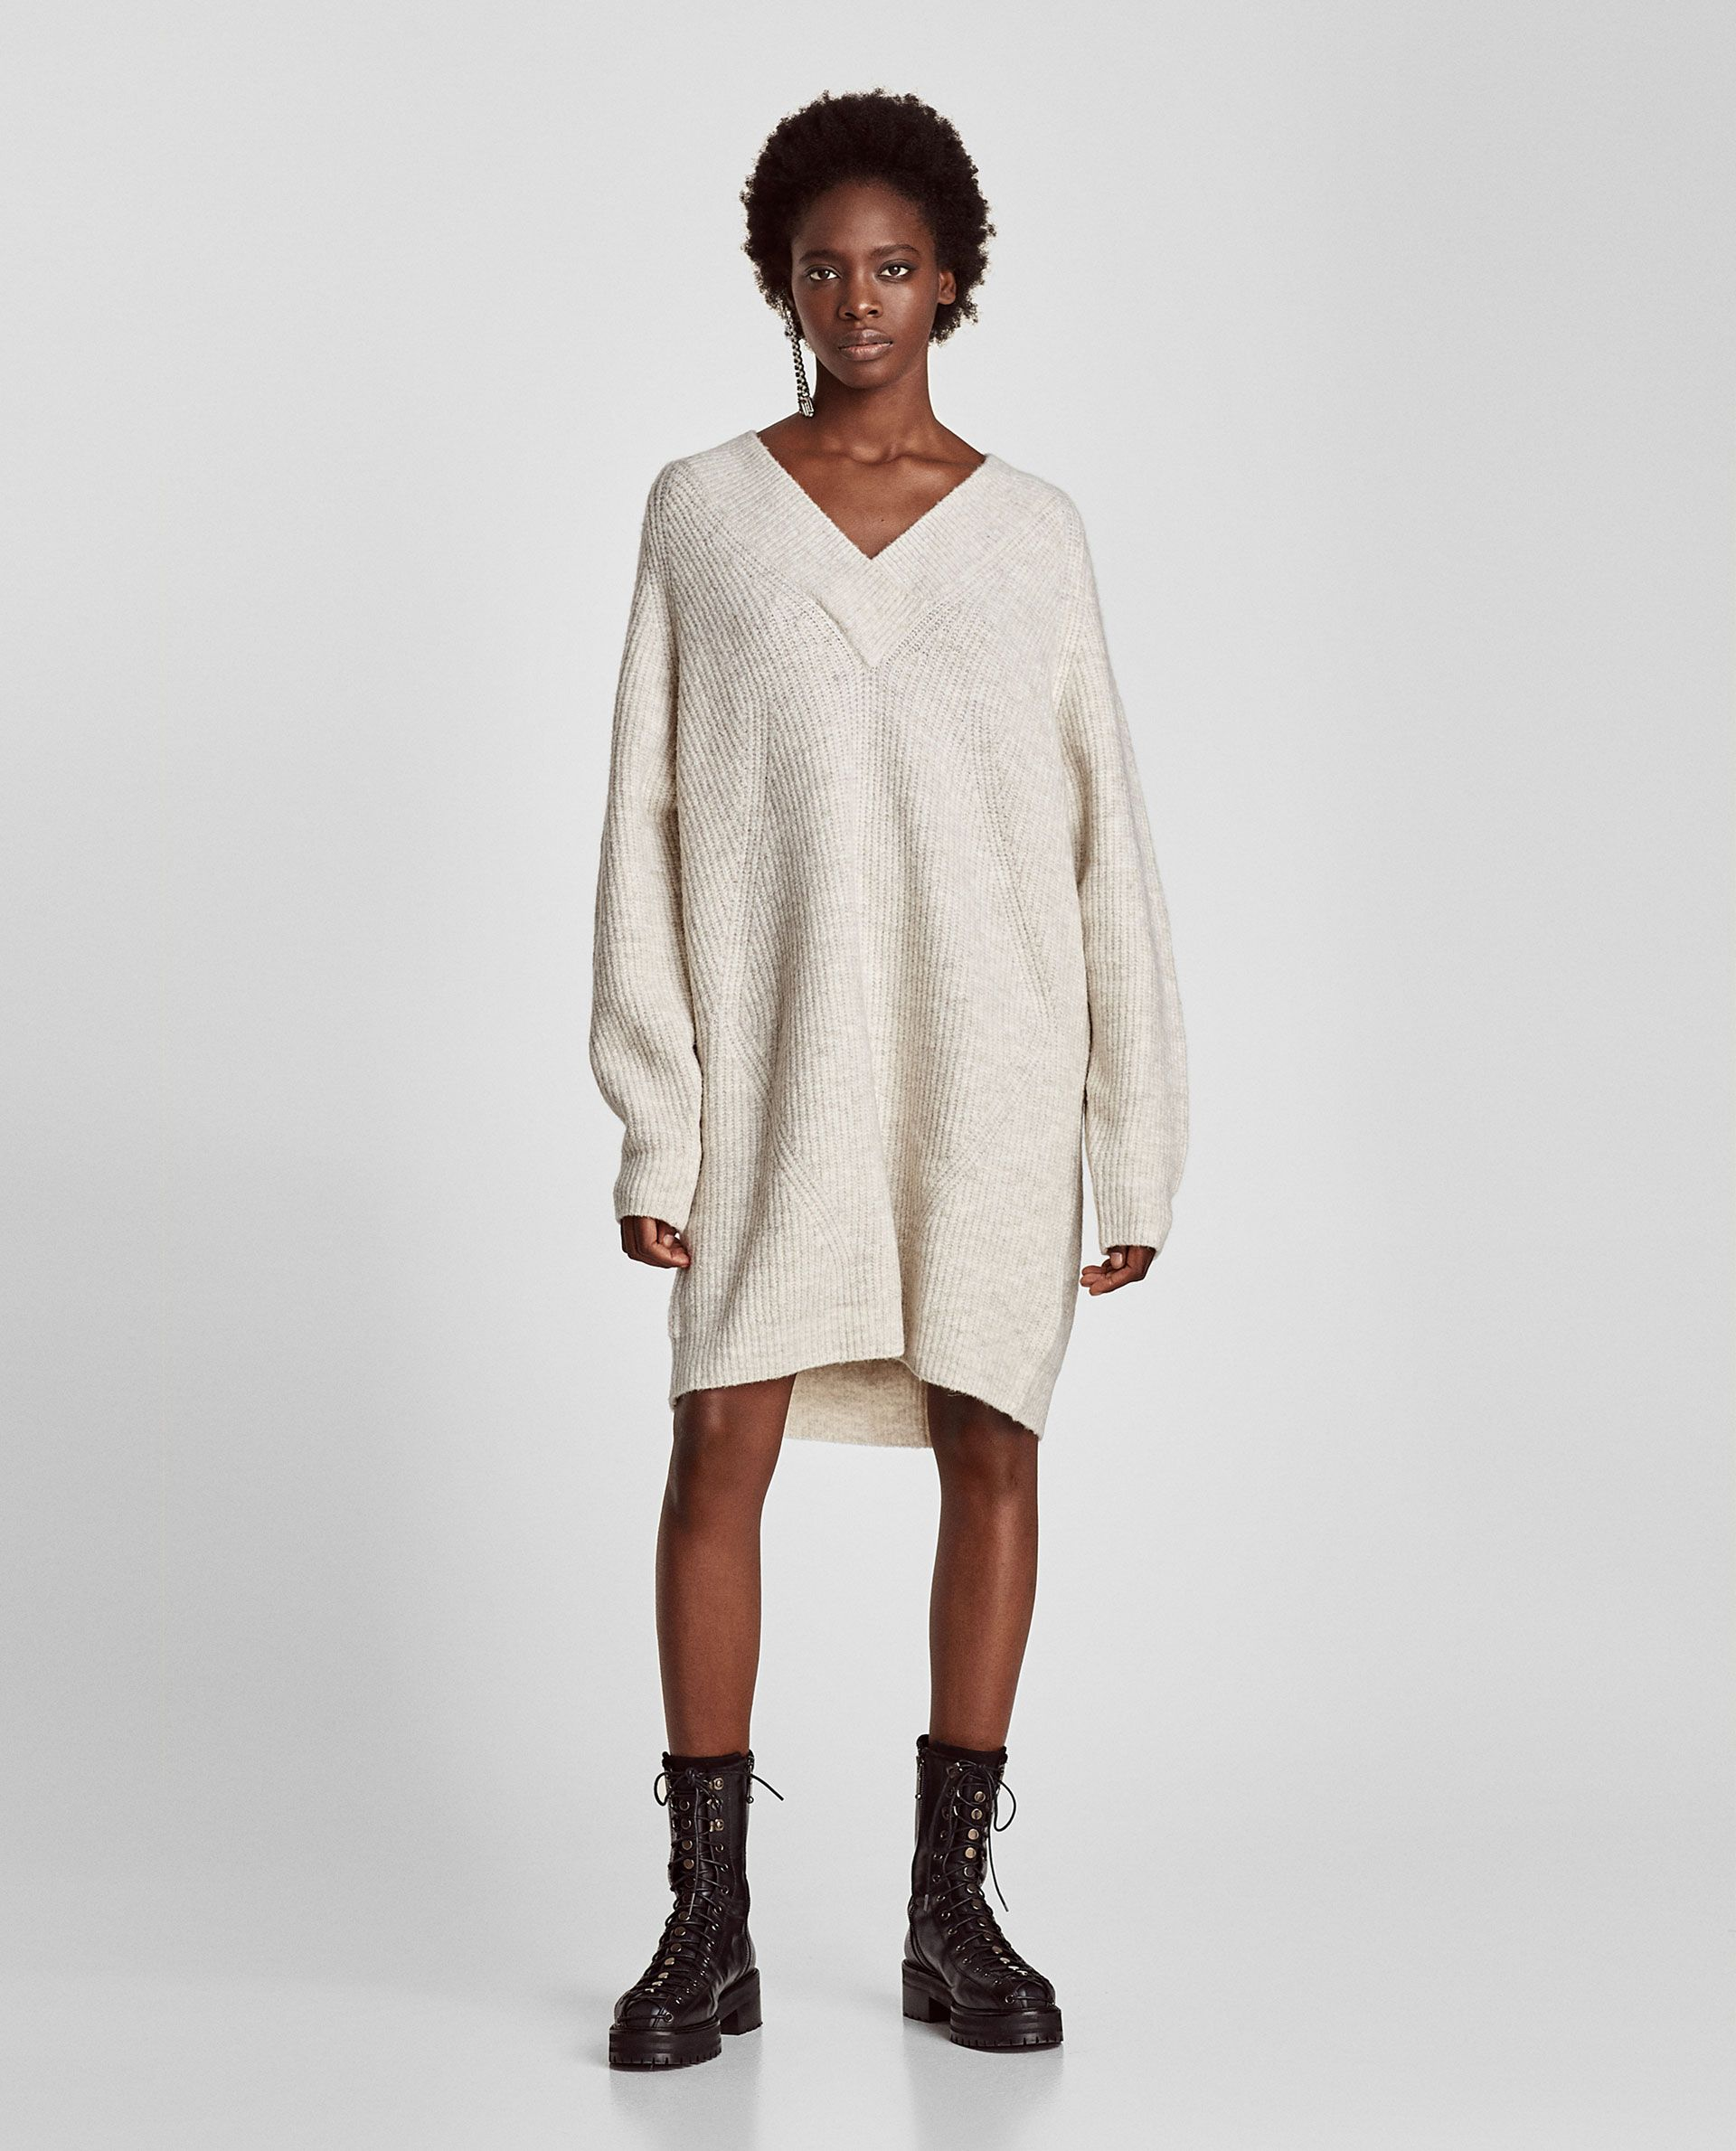 3669da6ee5 Image 1 of OVERSIZED SWEATER DRESS from Zara Dresses For Apple Shape